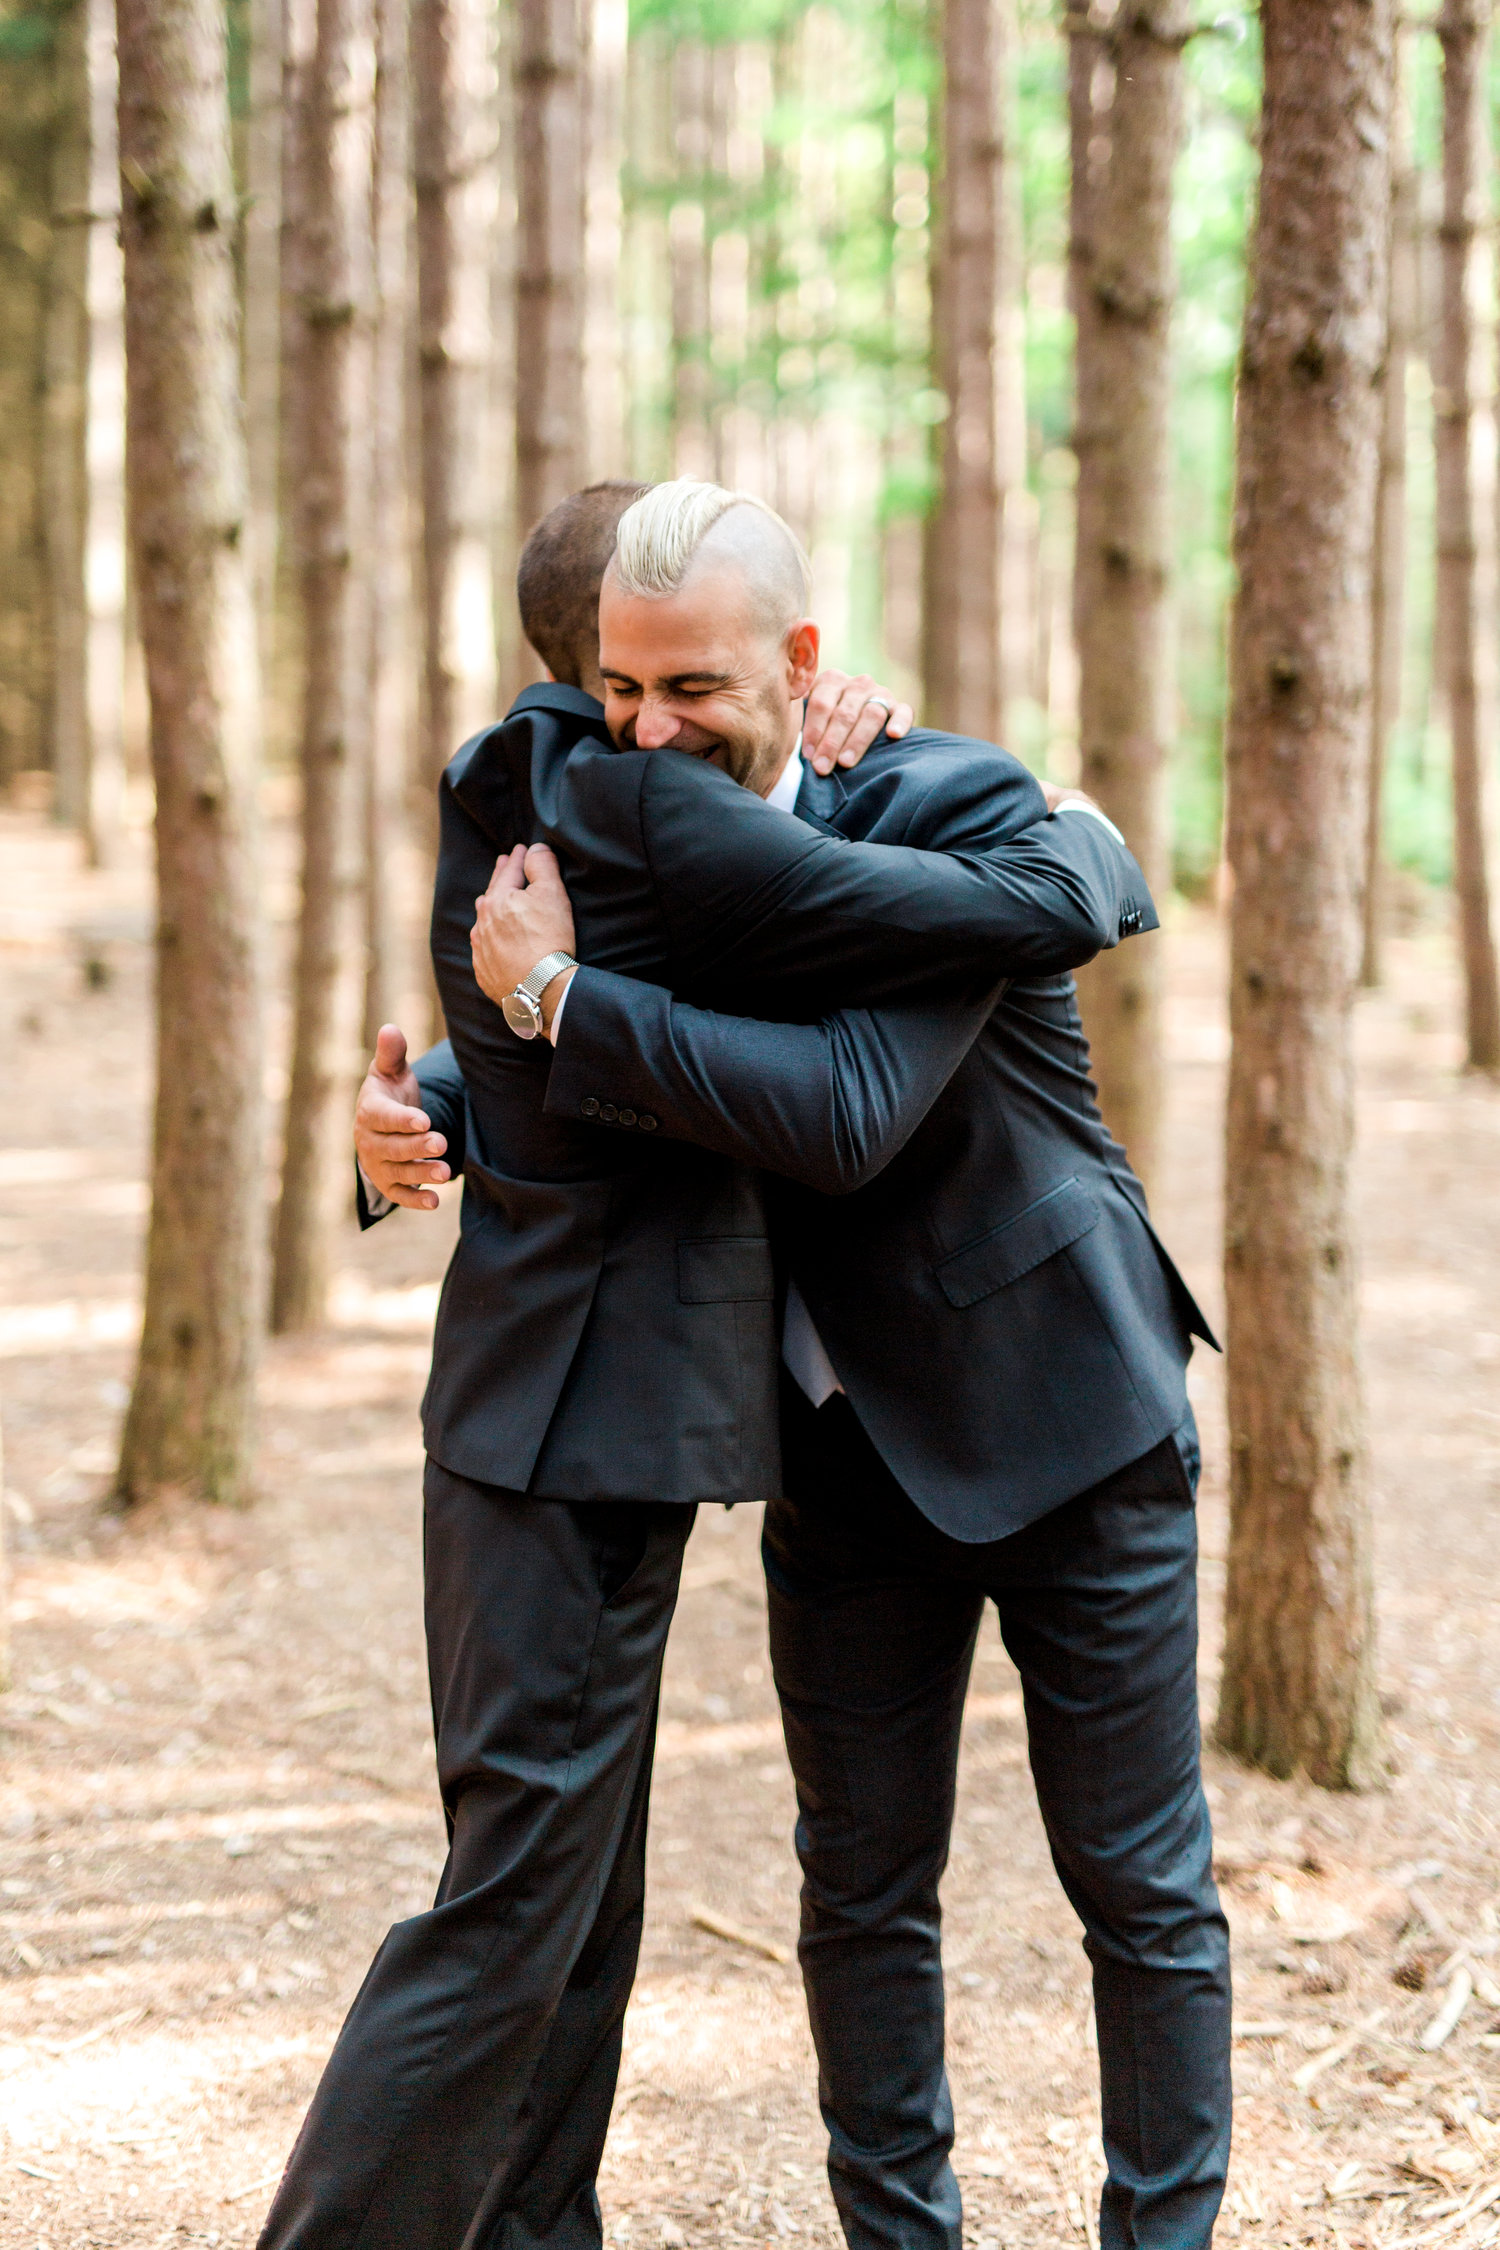 Danielle-Giroux-Amir-Golbazi-Toronto-Wedding-Photographer-Bellvue-Manor_DeLuca_1-628.jpg